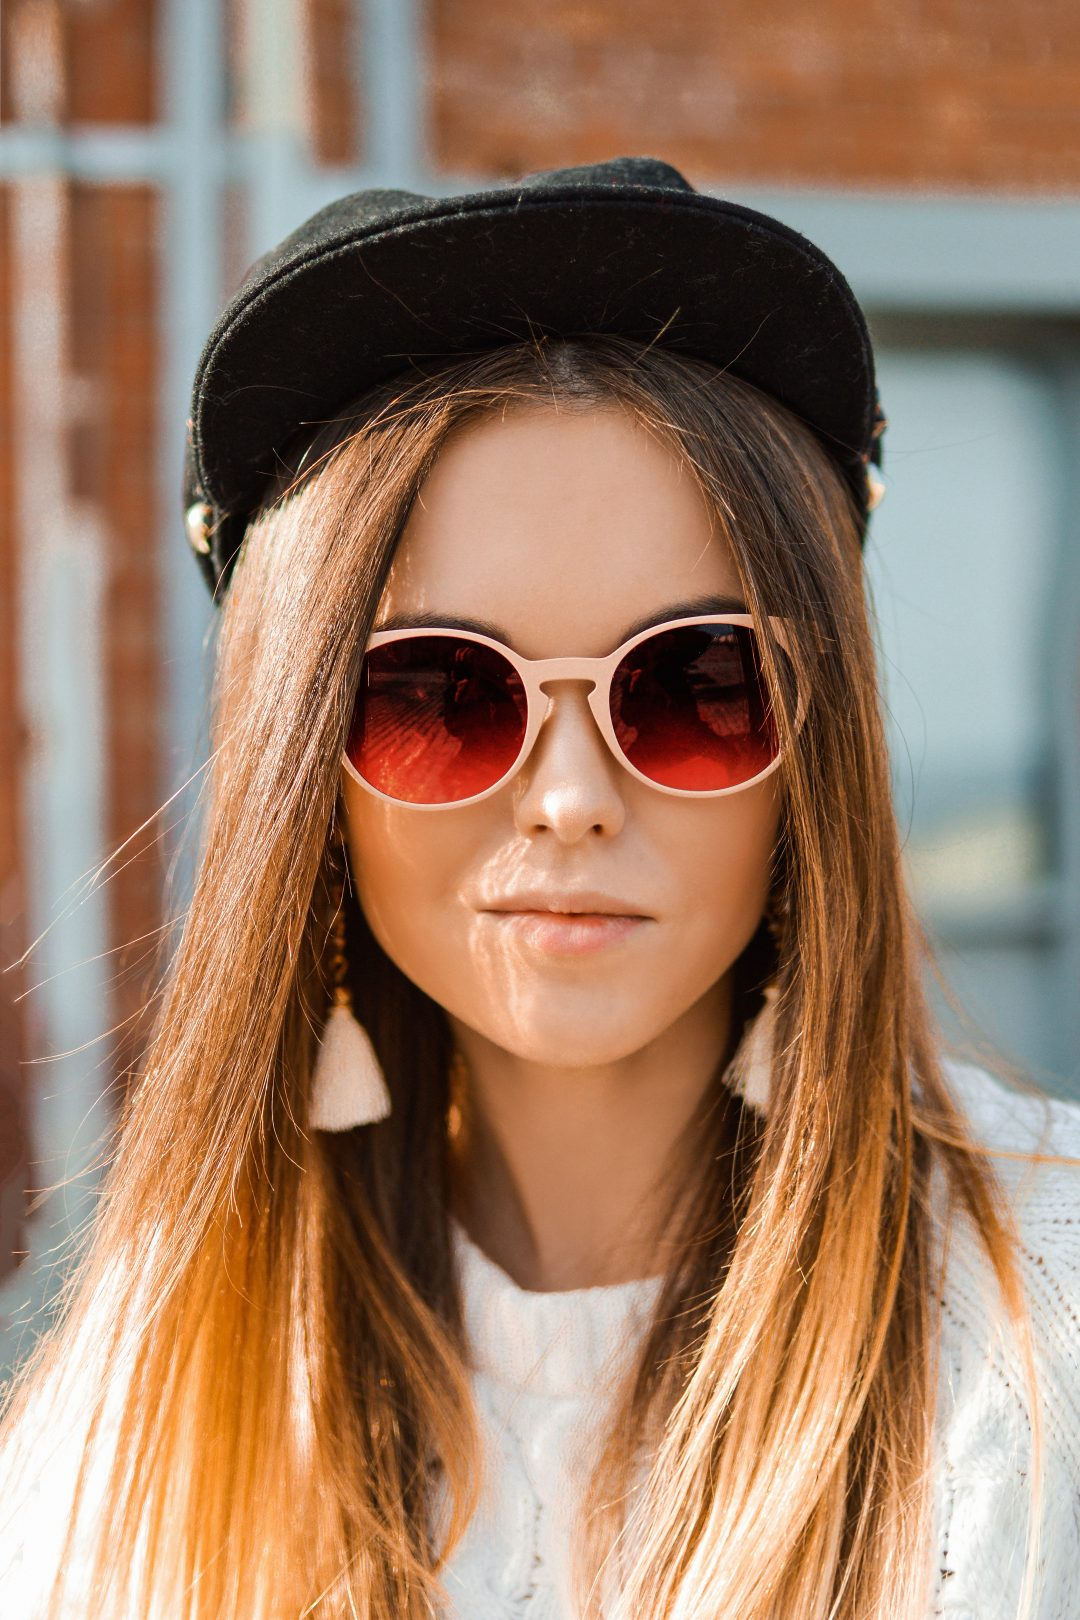 cute-barcelona-girls-red-glasses-baseball-cap